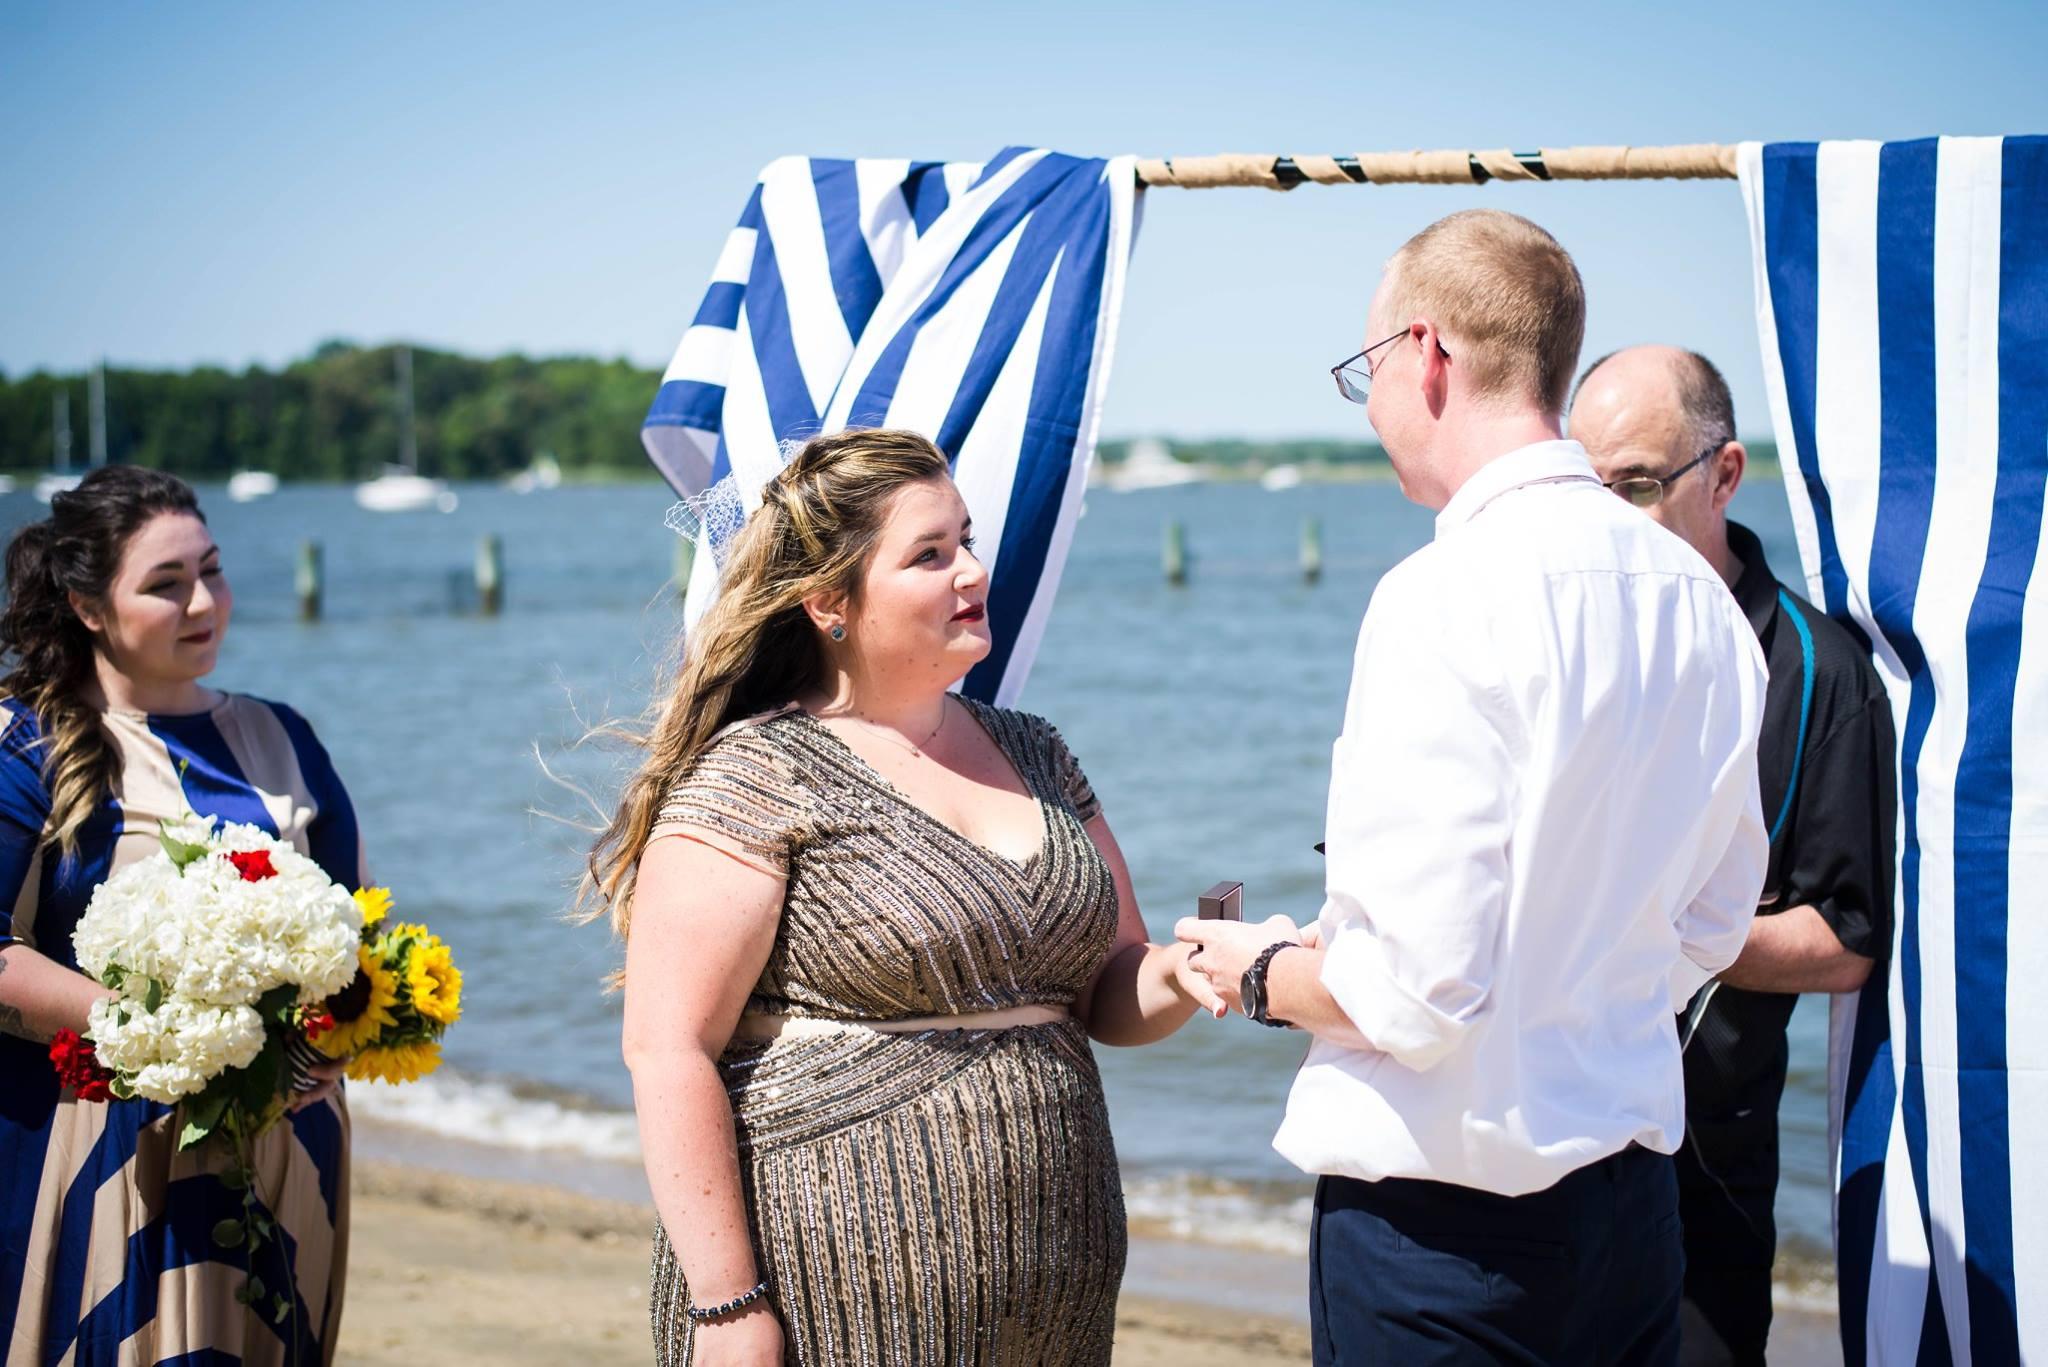 35_old_bay_wedding_ceremony_tangled.jpg